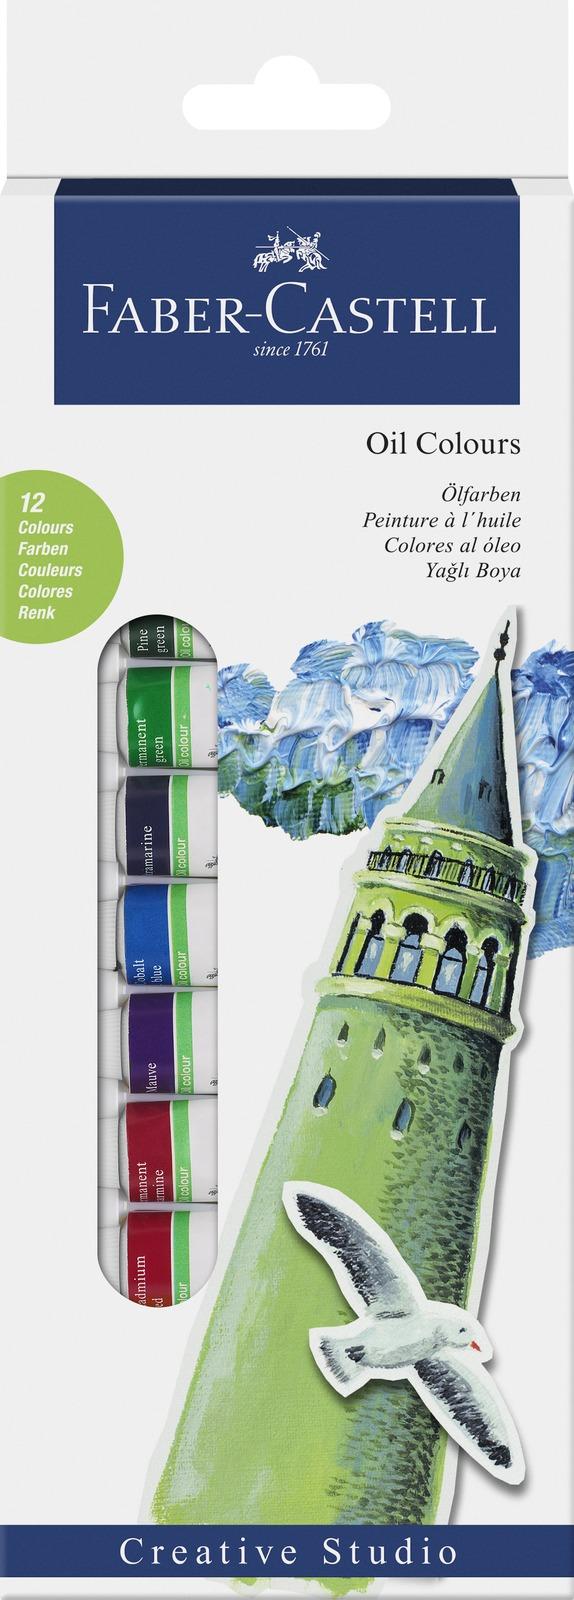 Faber-Castell: Starter Set Oil Colours Box (12 Pcs) image